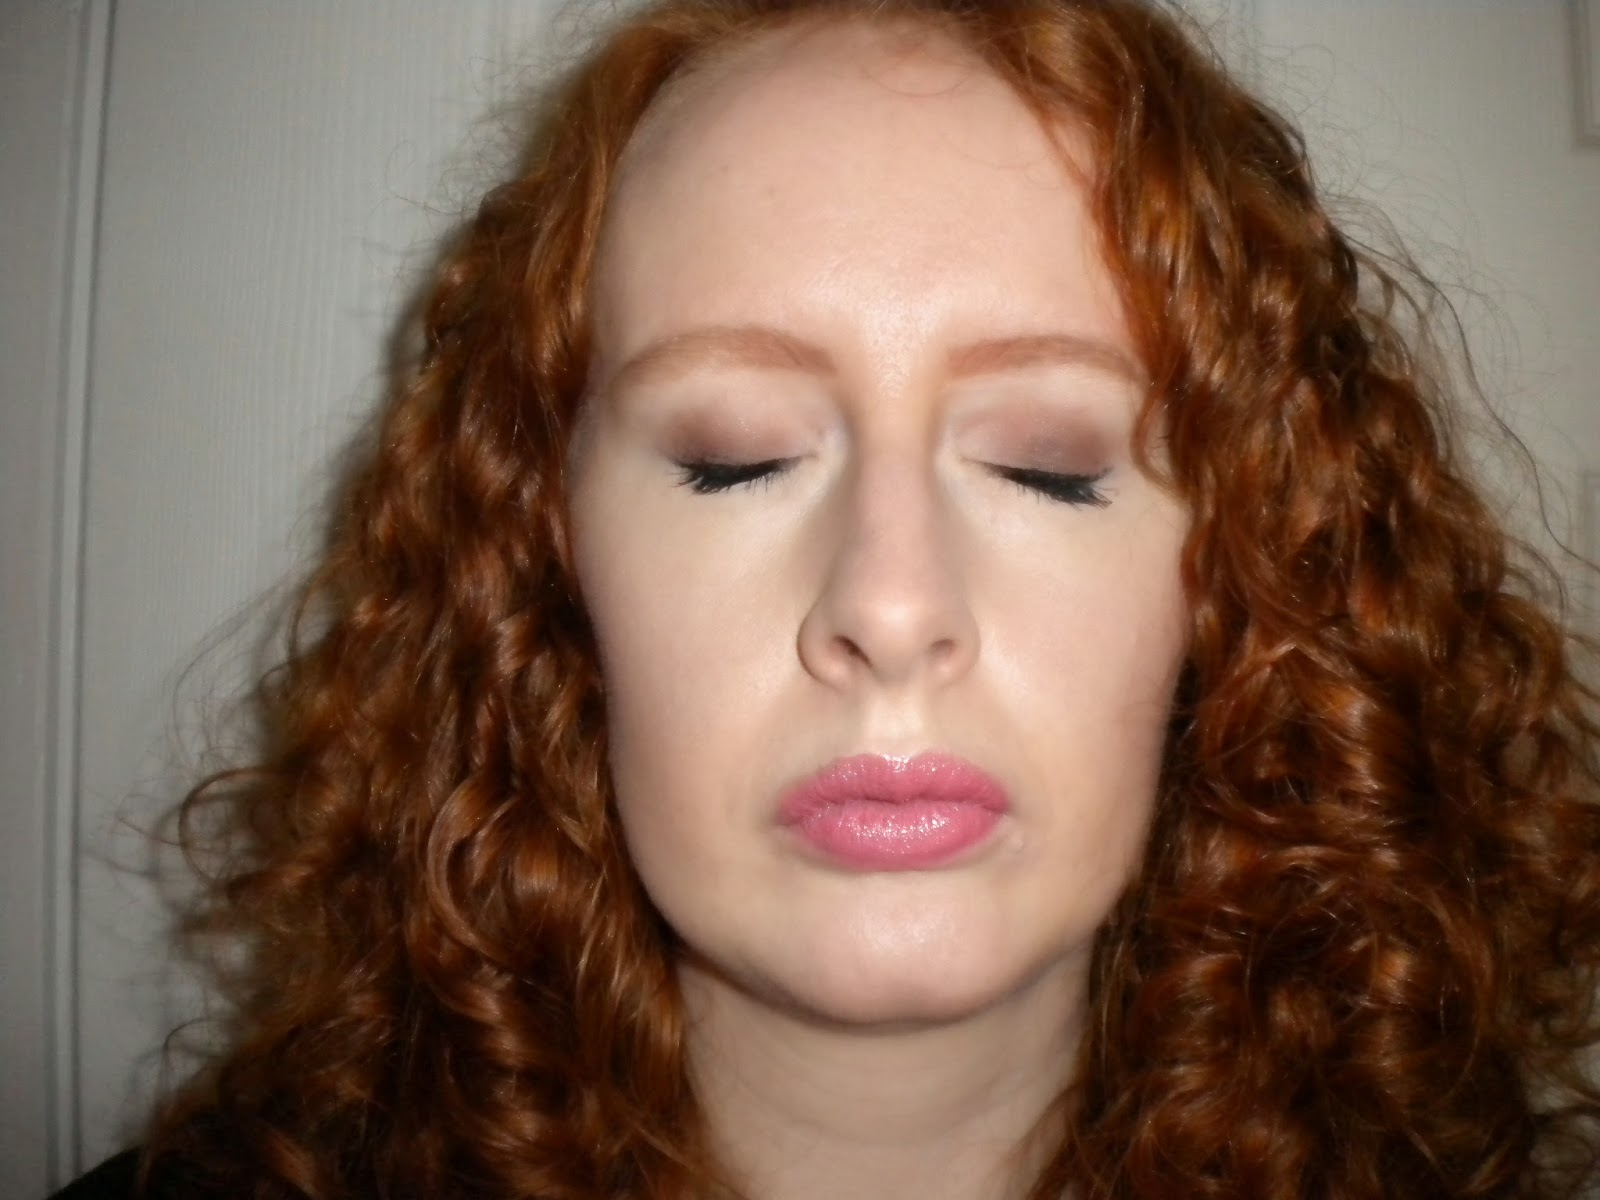 Mac Lipstick Dupes - Bobby Pins and Lip Gloss